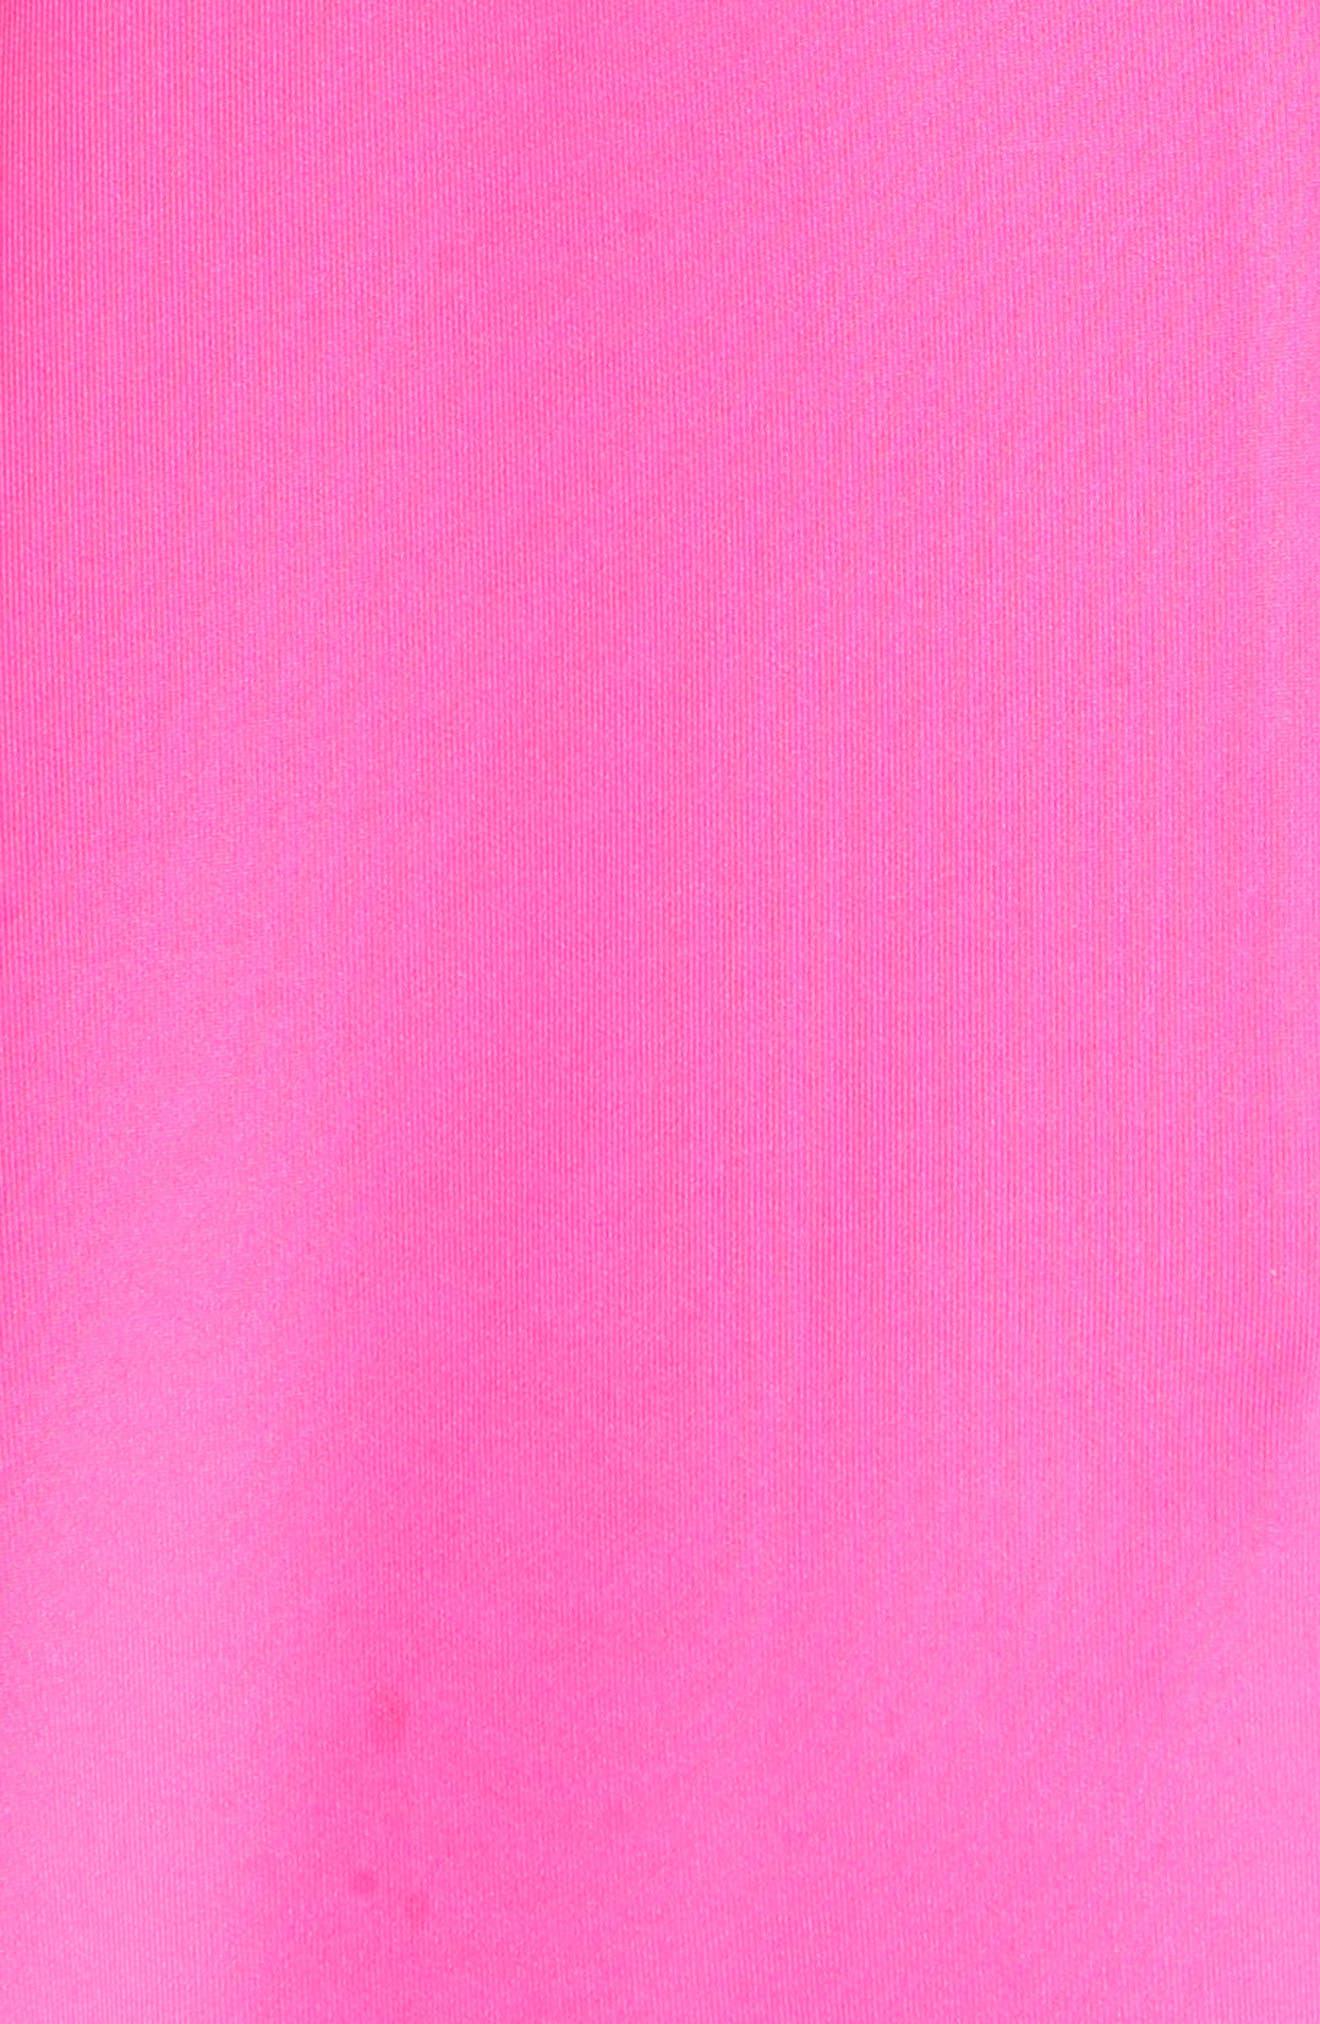 Jannett Laser Cut Ruffle Dress,                             Alternate thumbnail 5, color,                             Neon Pink